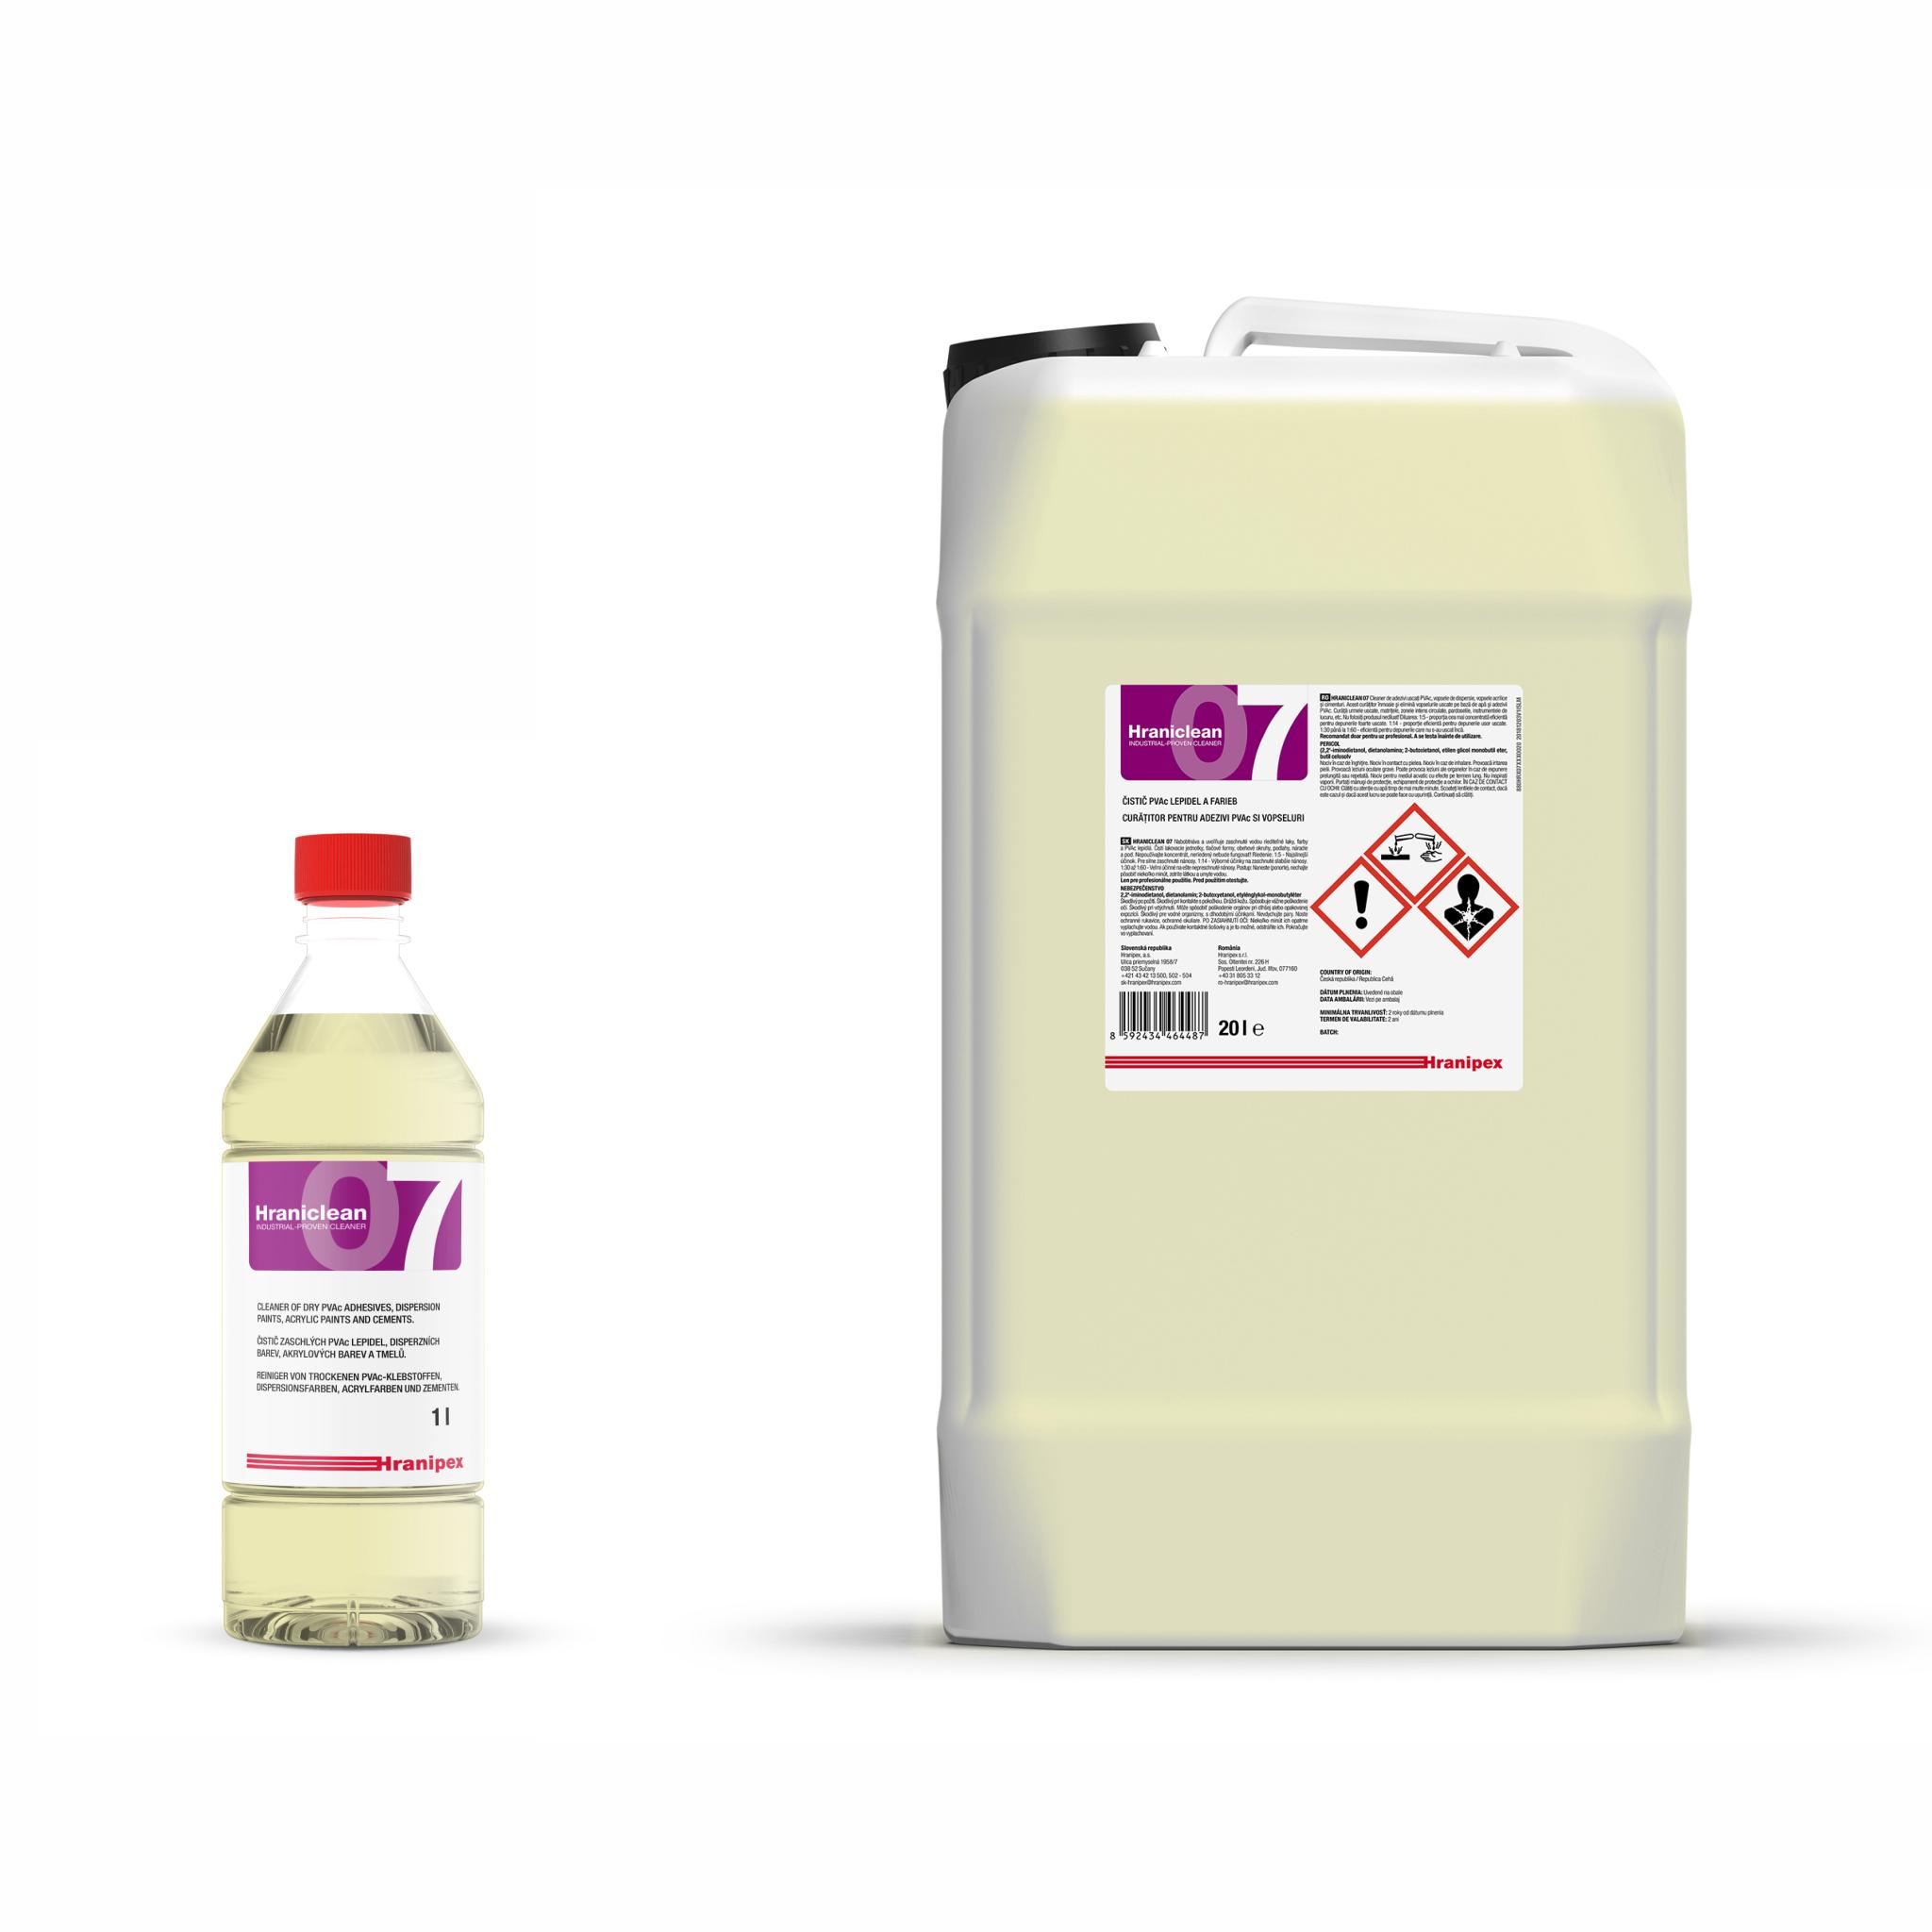 HRANICLEAN 07 čistič  PVAc lepidel a barev